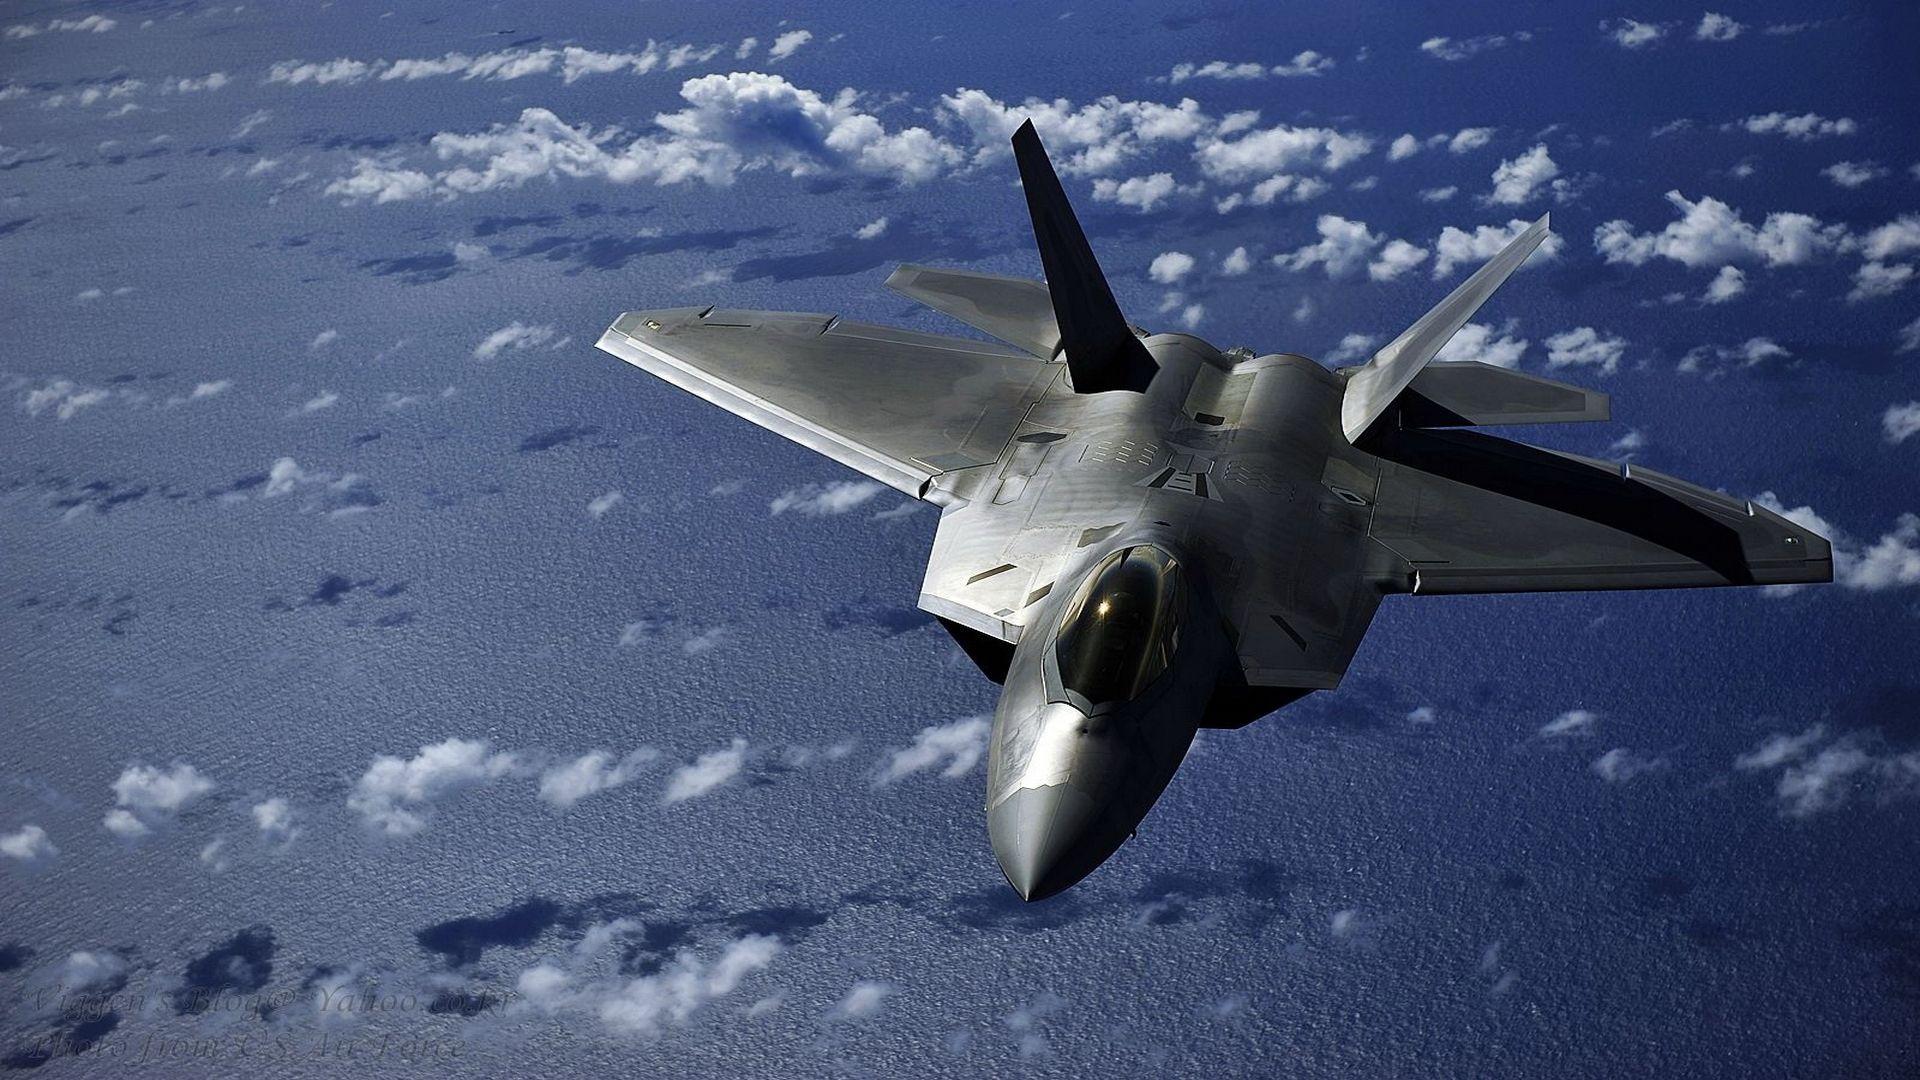 Raptor Lockheed Raptor Fighter Jets